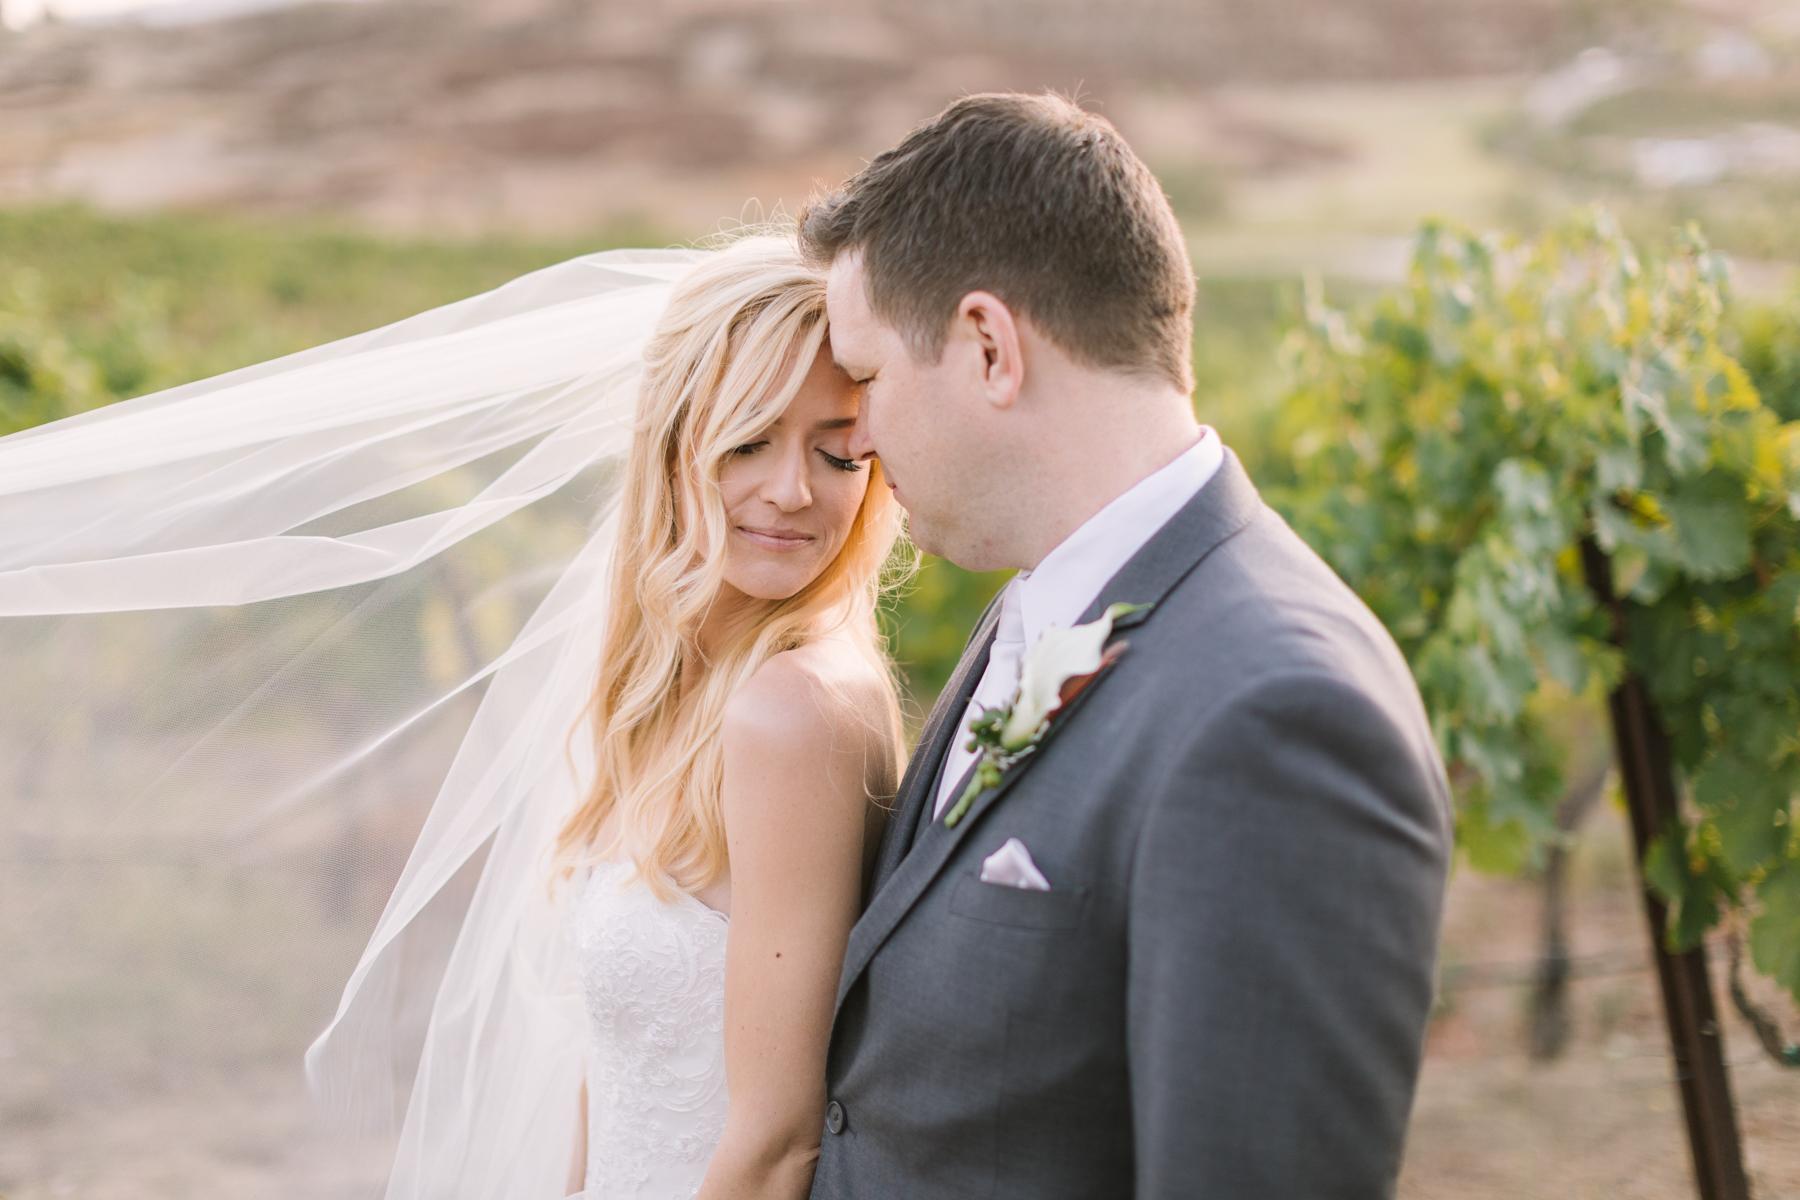 Orange-County-Wedding-Photography-Brianna-Caster-and-Co-Photographers-Falkner-Winery-Wedding-12